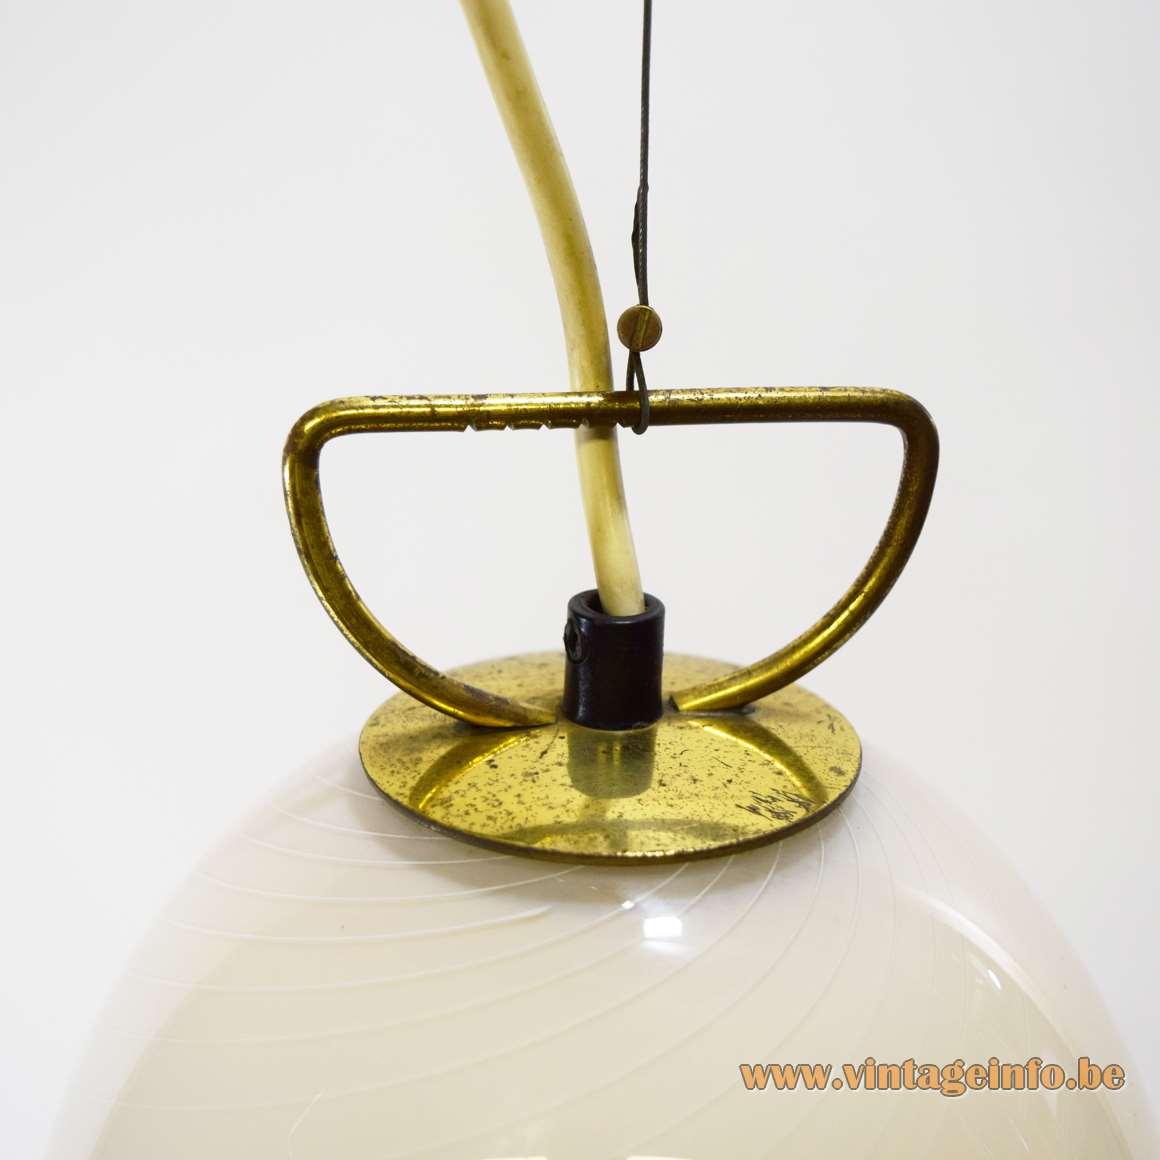 Murano Petticoat Pendant Lamp - Parts